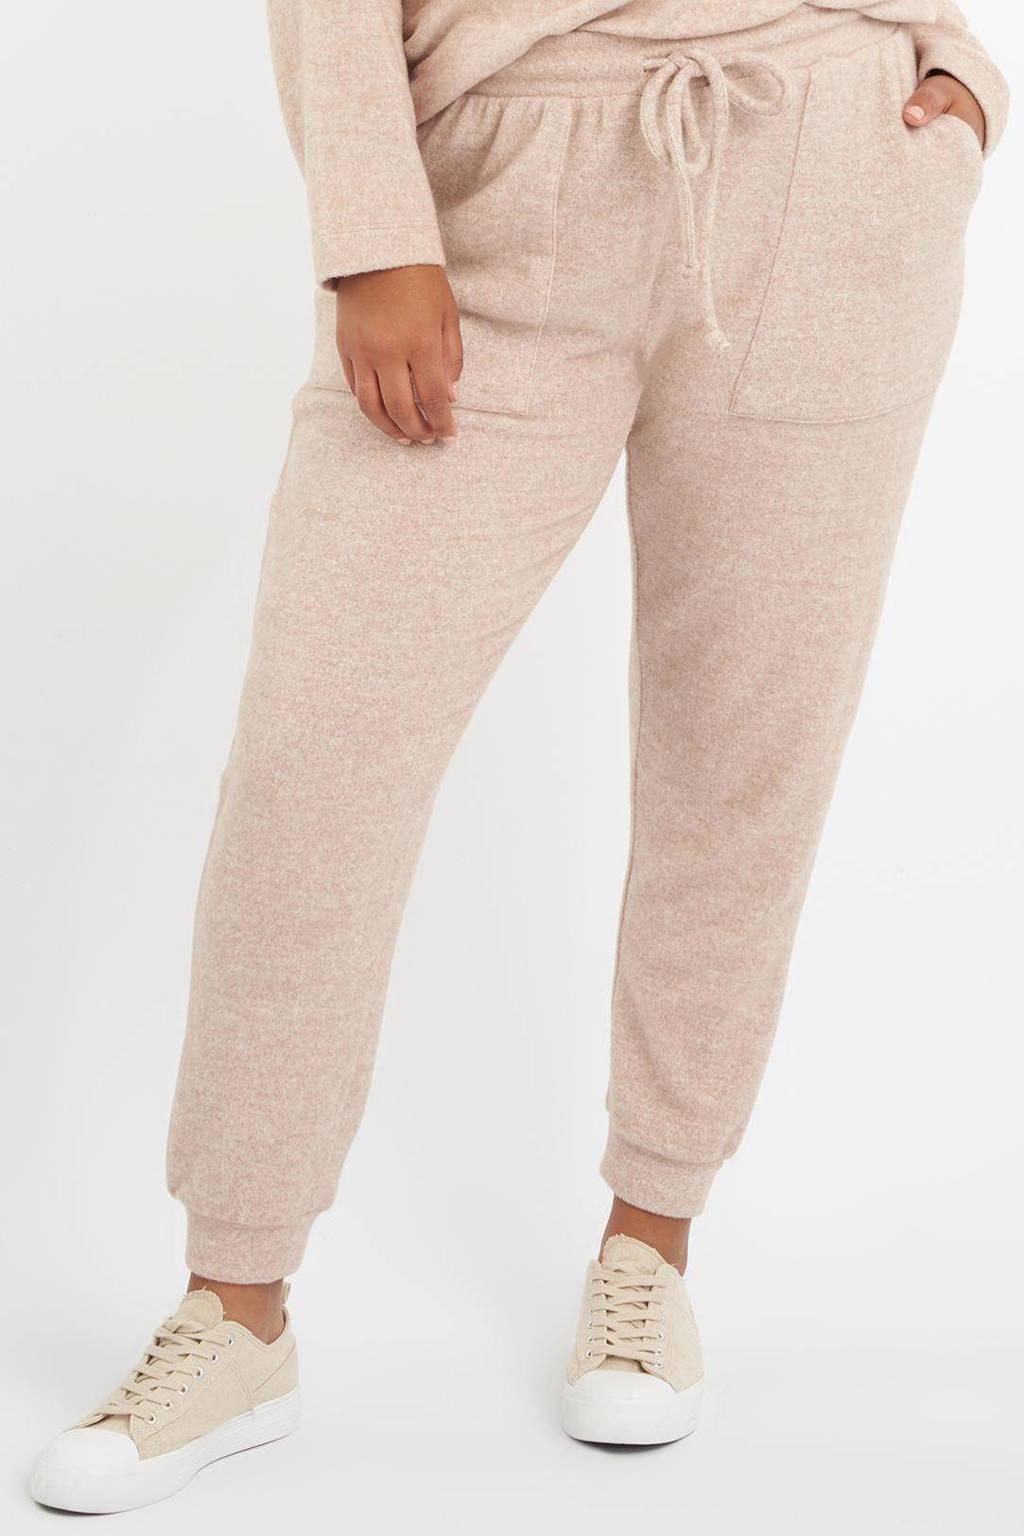 MS Mode high waist slim fit joggingbroek beige, Beige